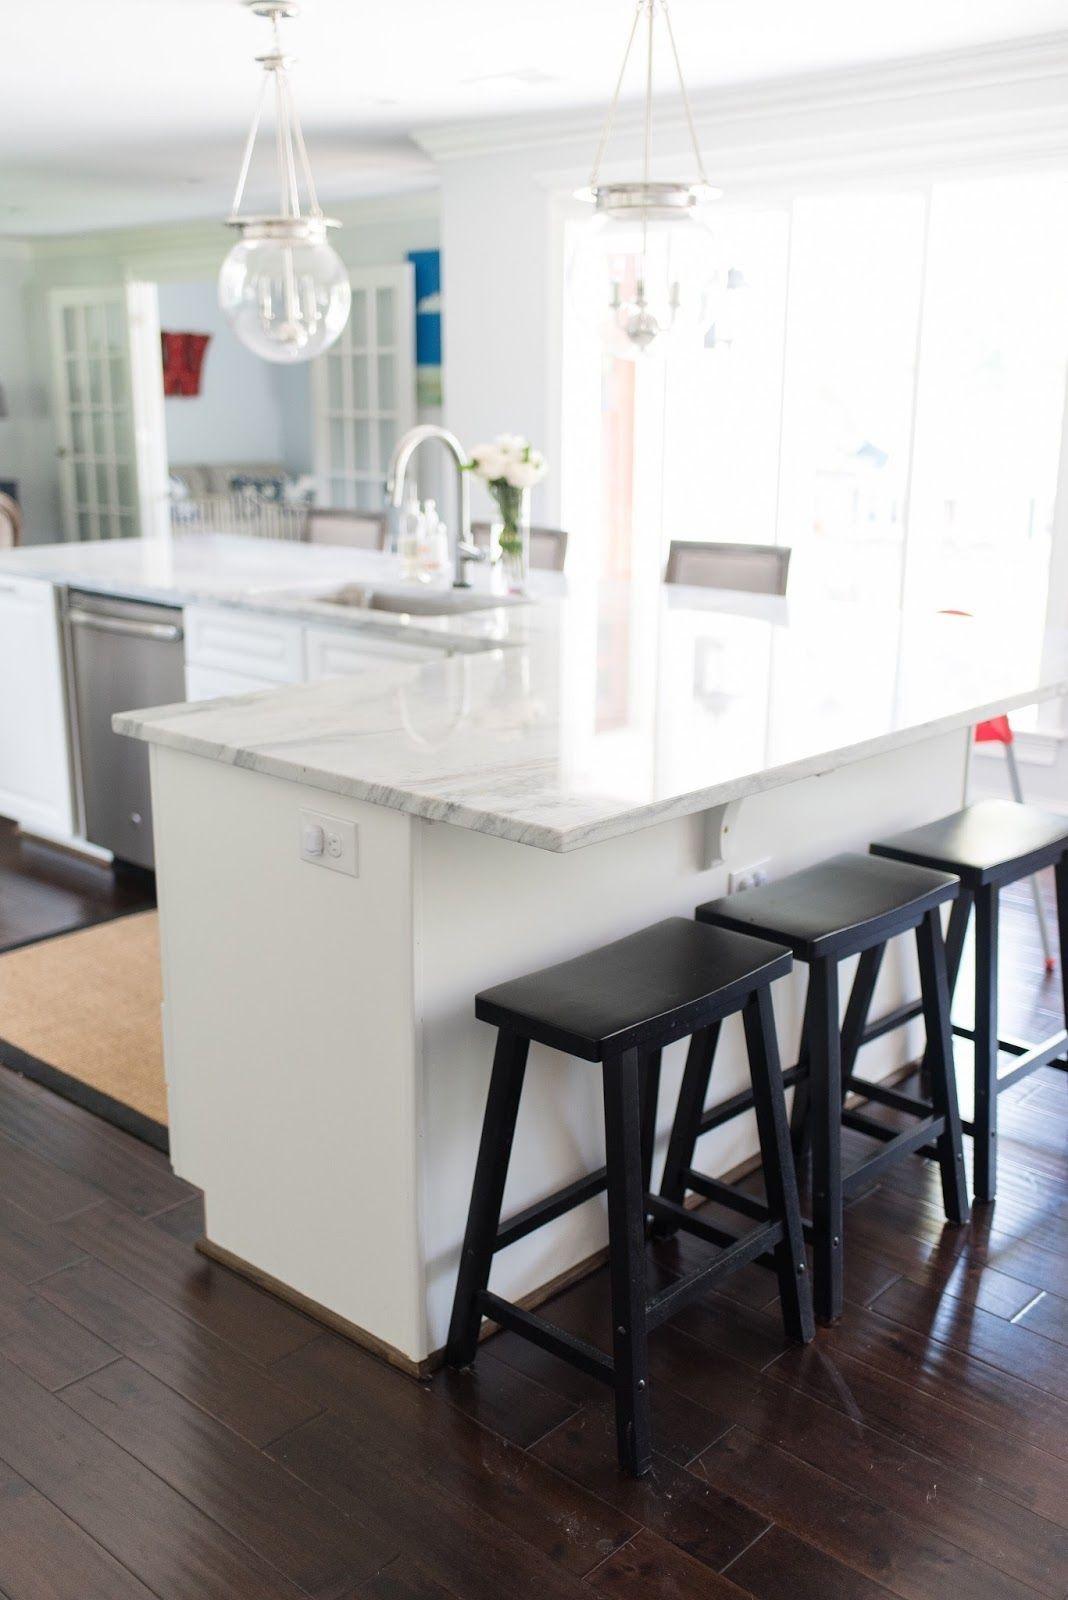 Admiring Granite Kitchen Countertops Ideas That You Shouldnt Miss44